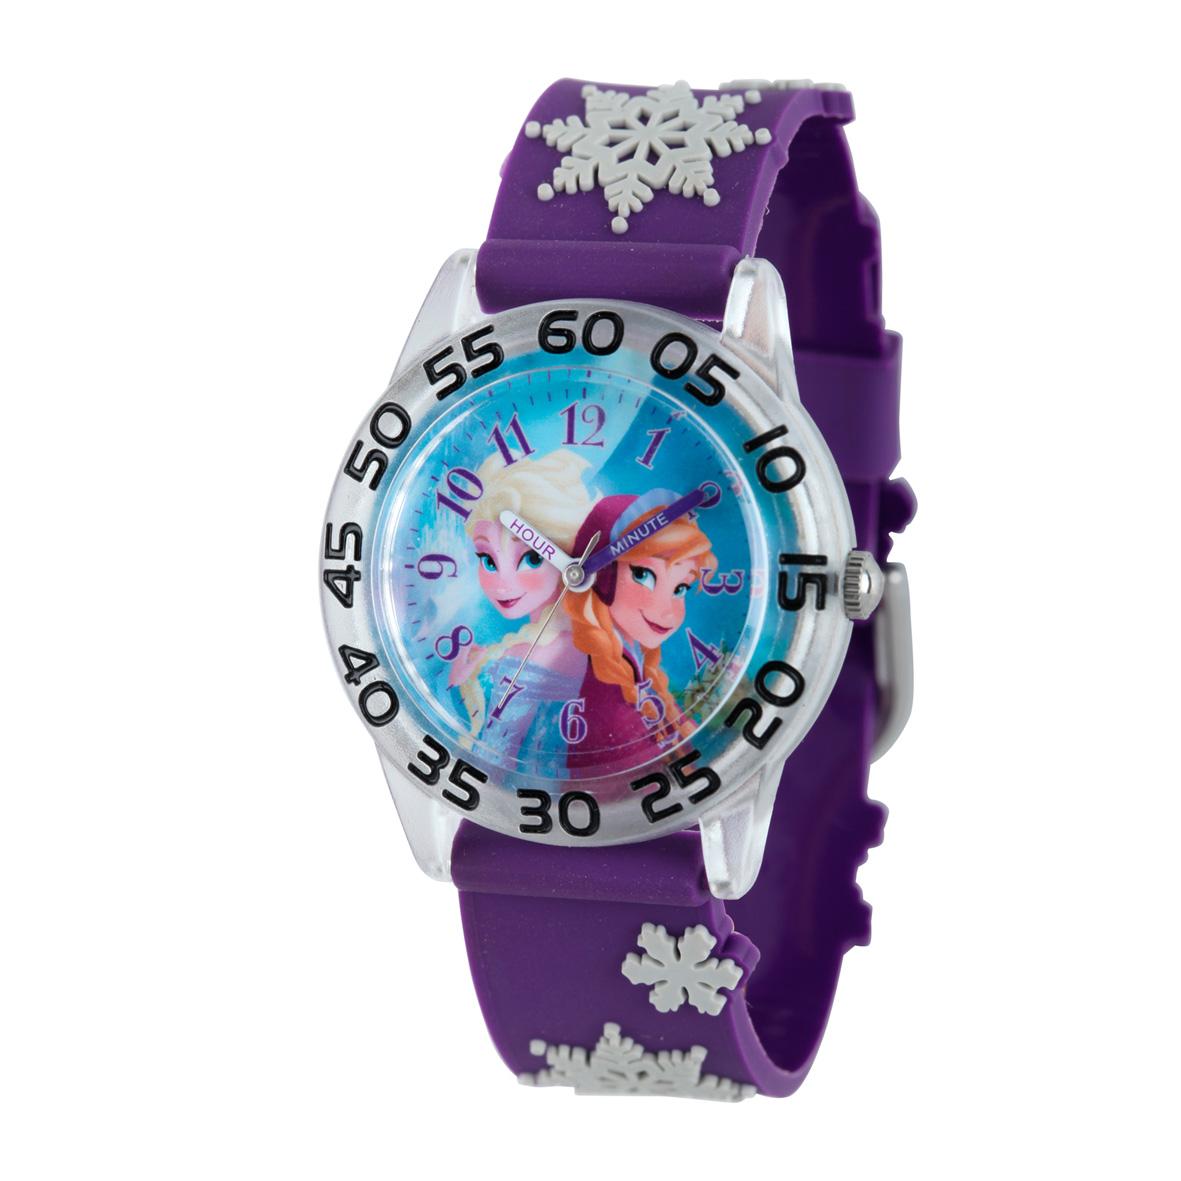 DIW002033_disney-marvel_watches.jpg